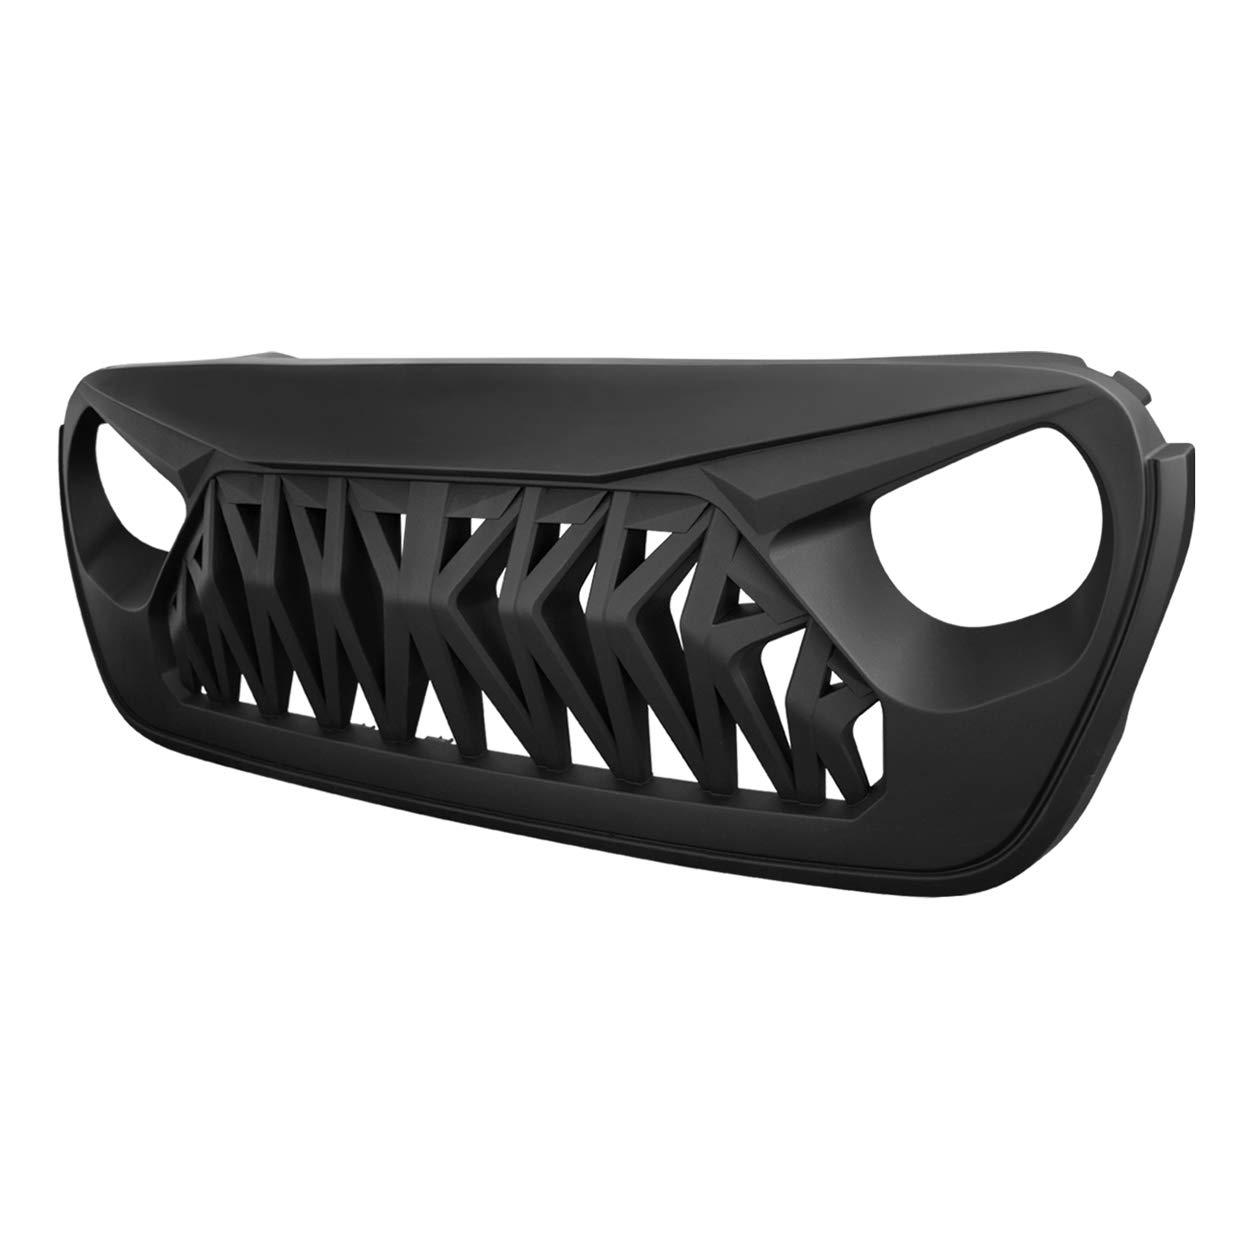 Allinoneparts White /& Black Front Shark Grille for 2018-2019 JL JLU Jeep Wrangler Rubicon Sahara Sport ABS